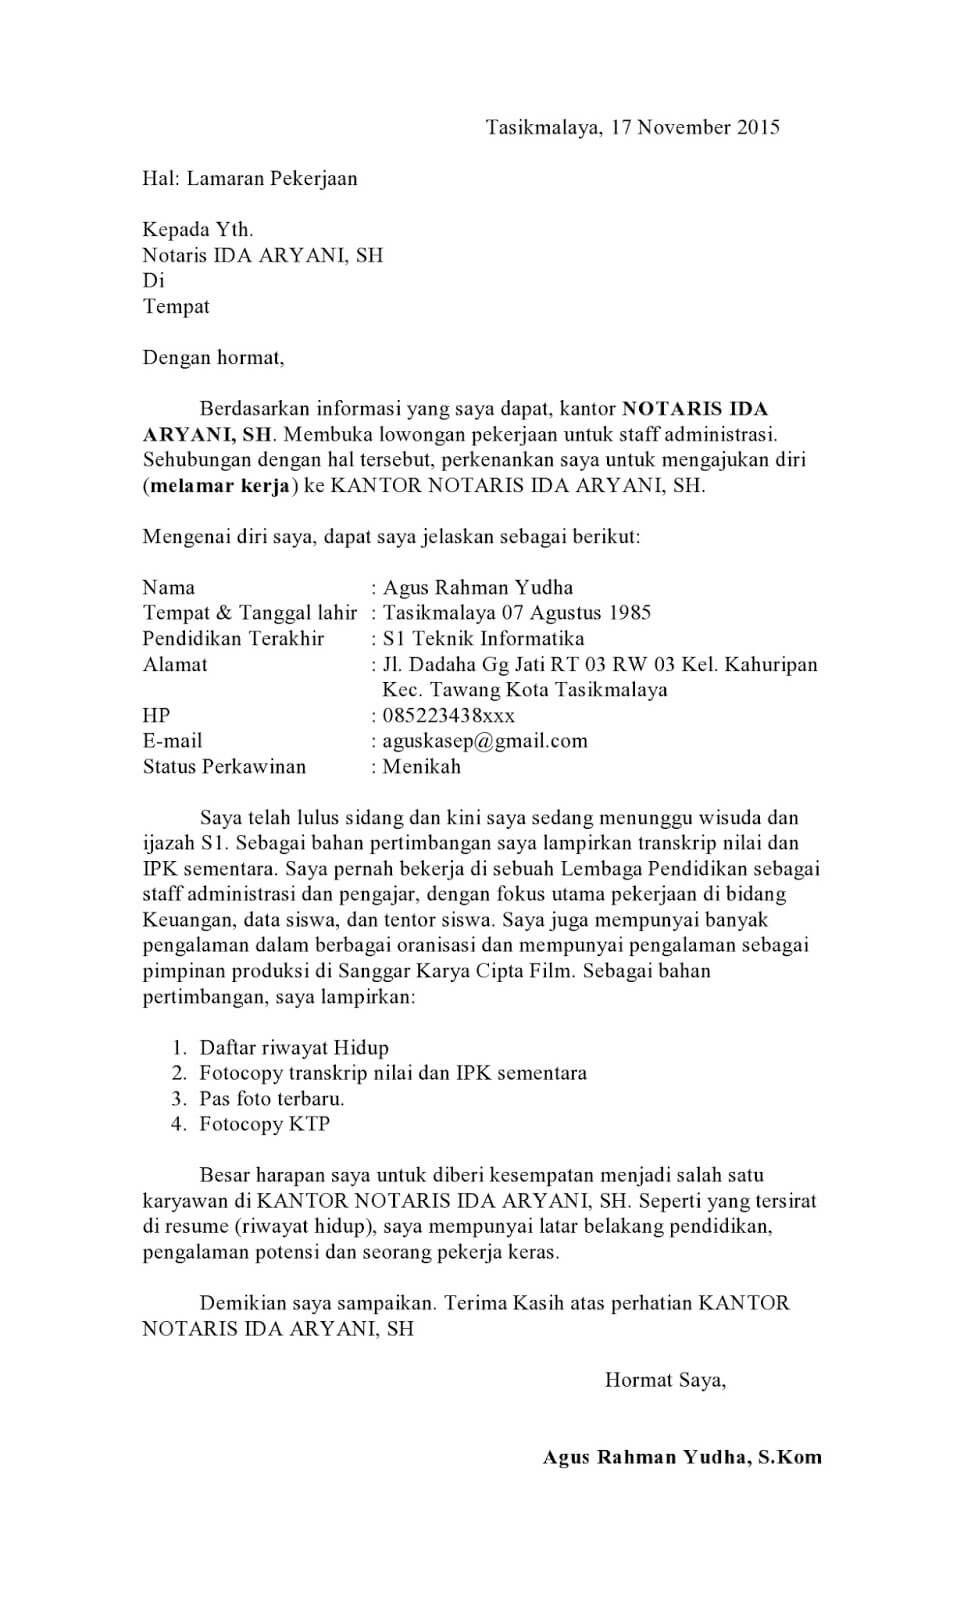 Contoh Surat Lamaran Kerja Di Kantor Notaris Lihat